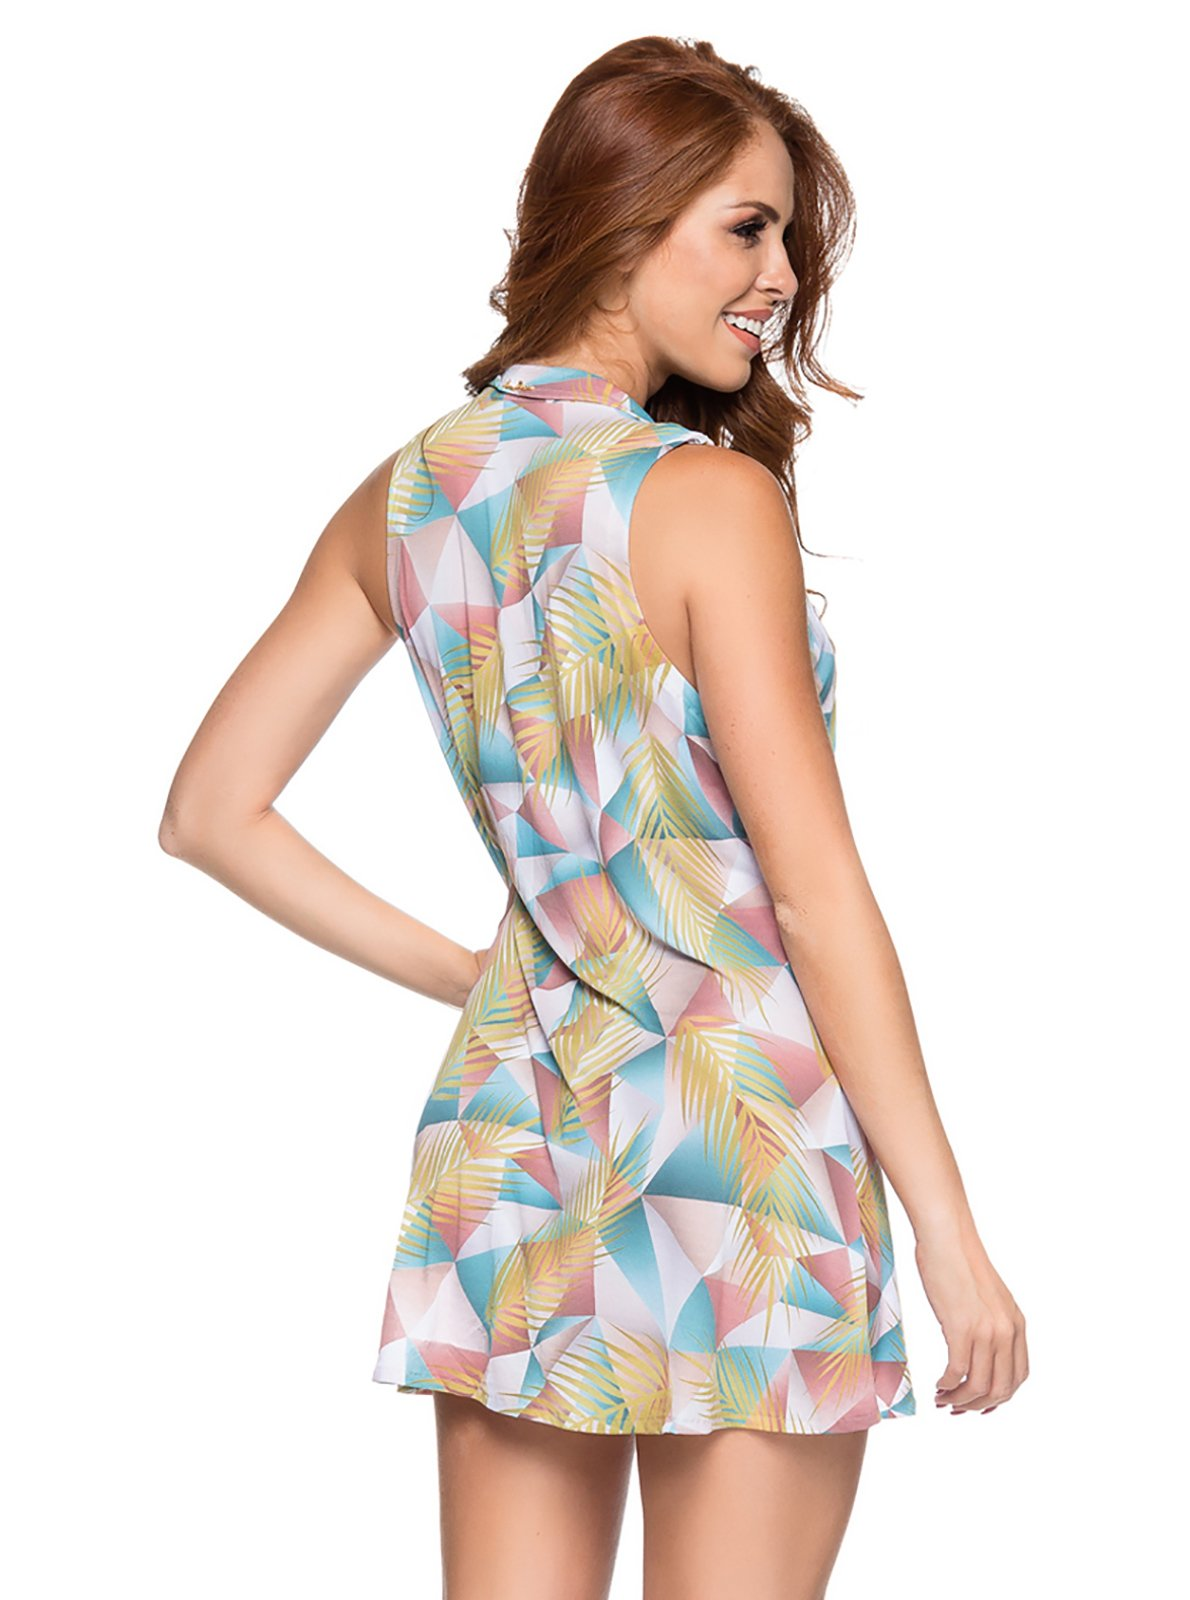 057da62de2 ... Geometric pastel shirt sleeveless dress - REGATA GOLA GEOMETRIC ART